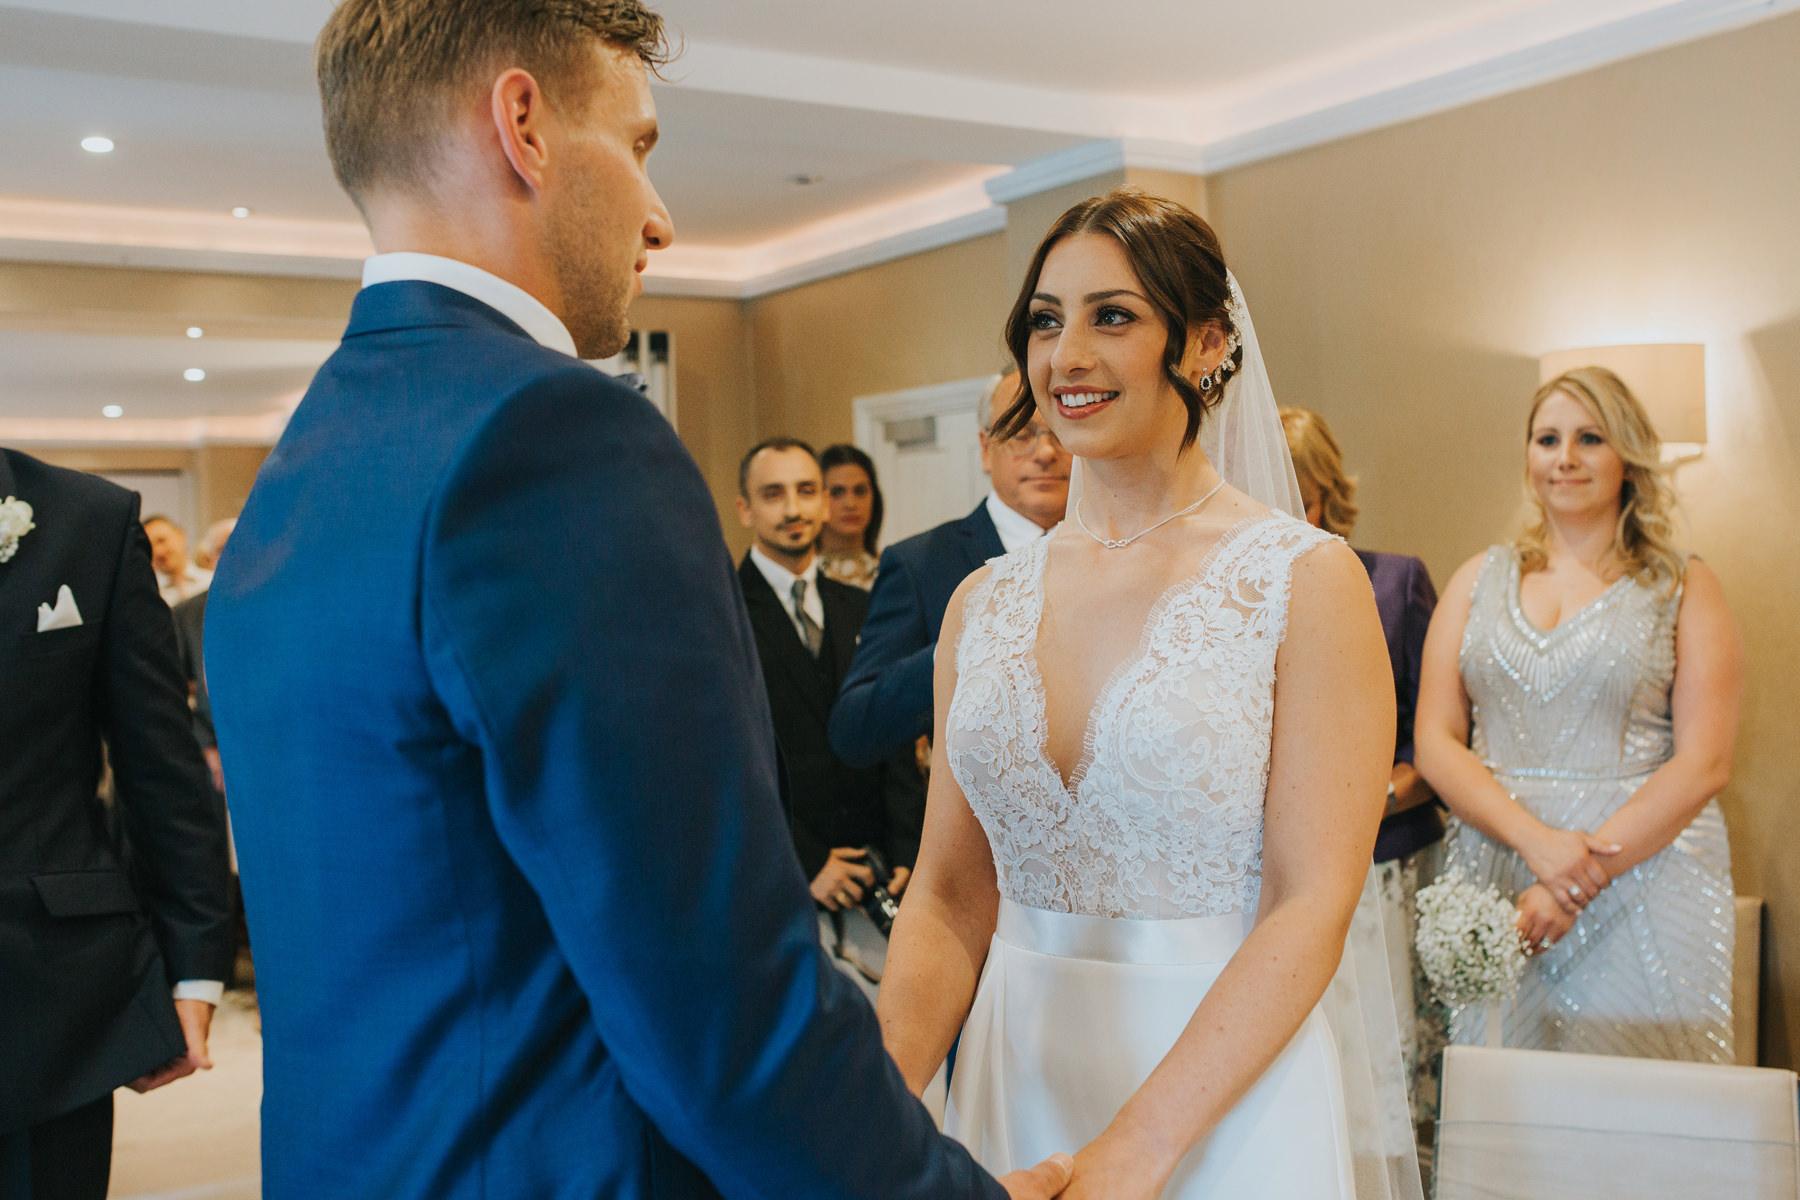 Richmond The Bingham Wedding Photographer London--groom bride ceremony exchanging rings-CRL-157.jpg